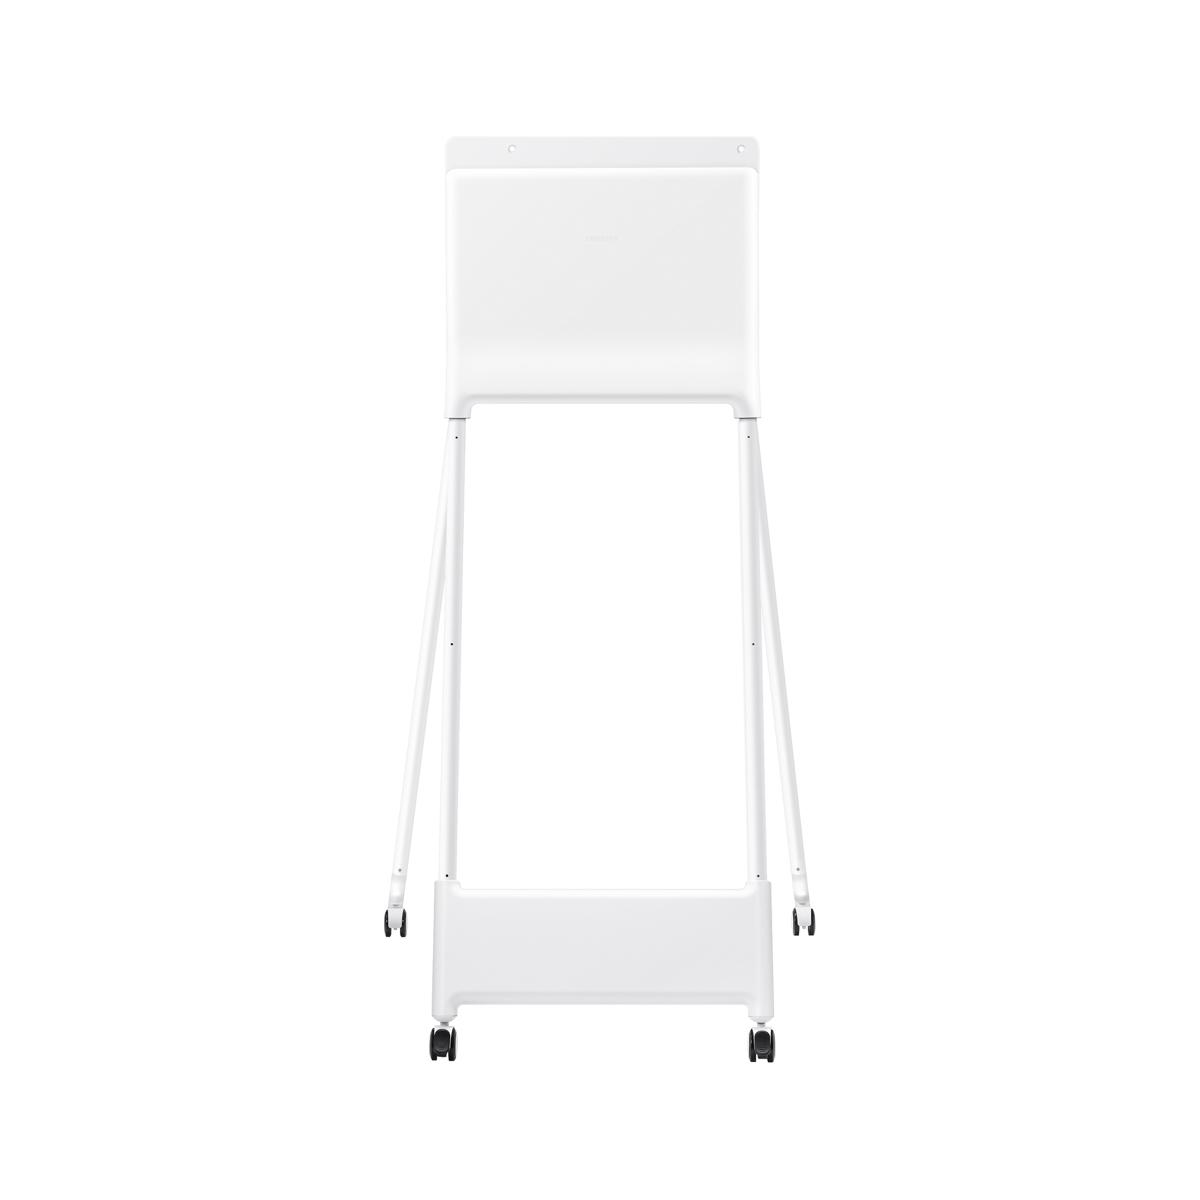 Samsung STN-WM55R Flip 2 Stand | for Business